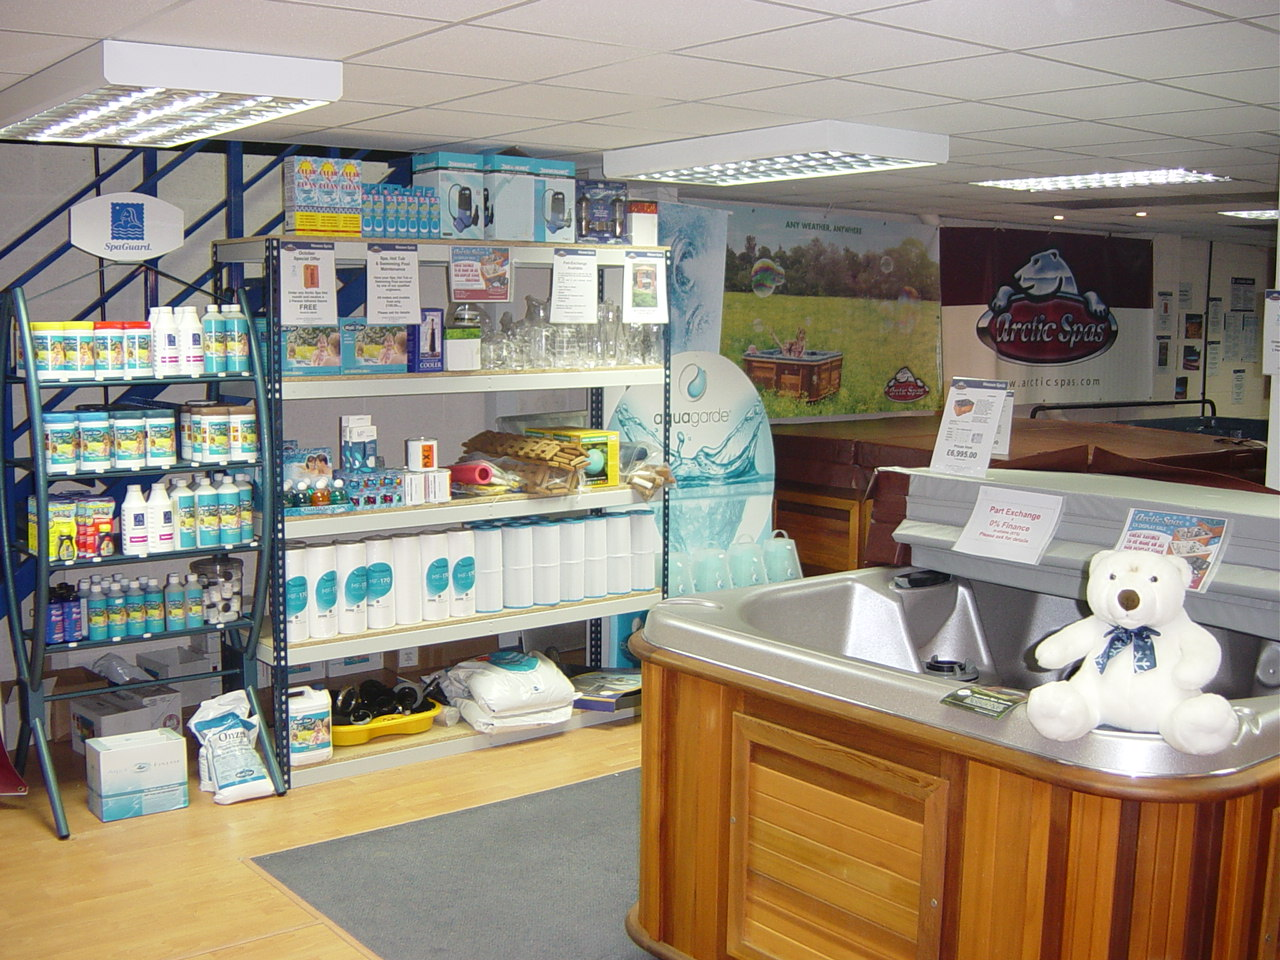 Wessex Spas showroom photo